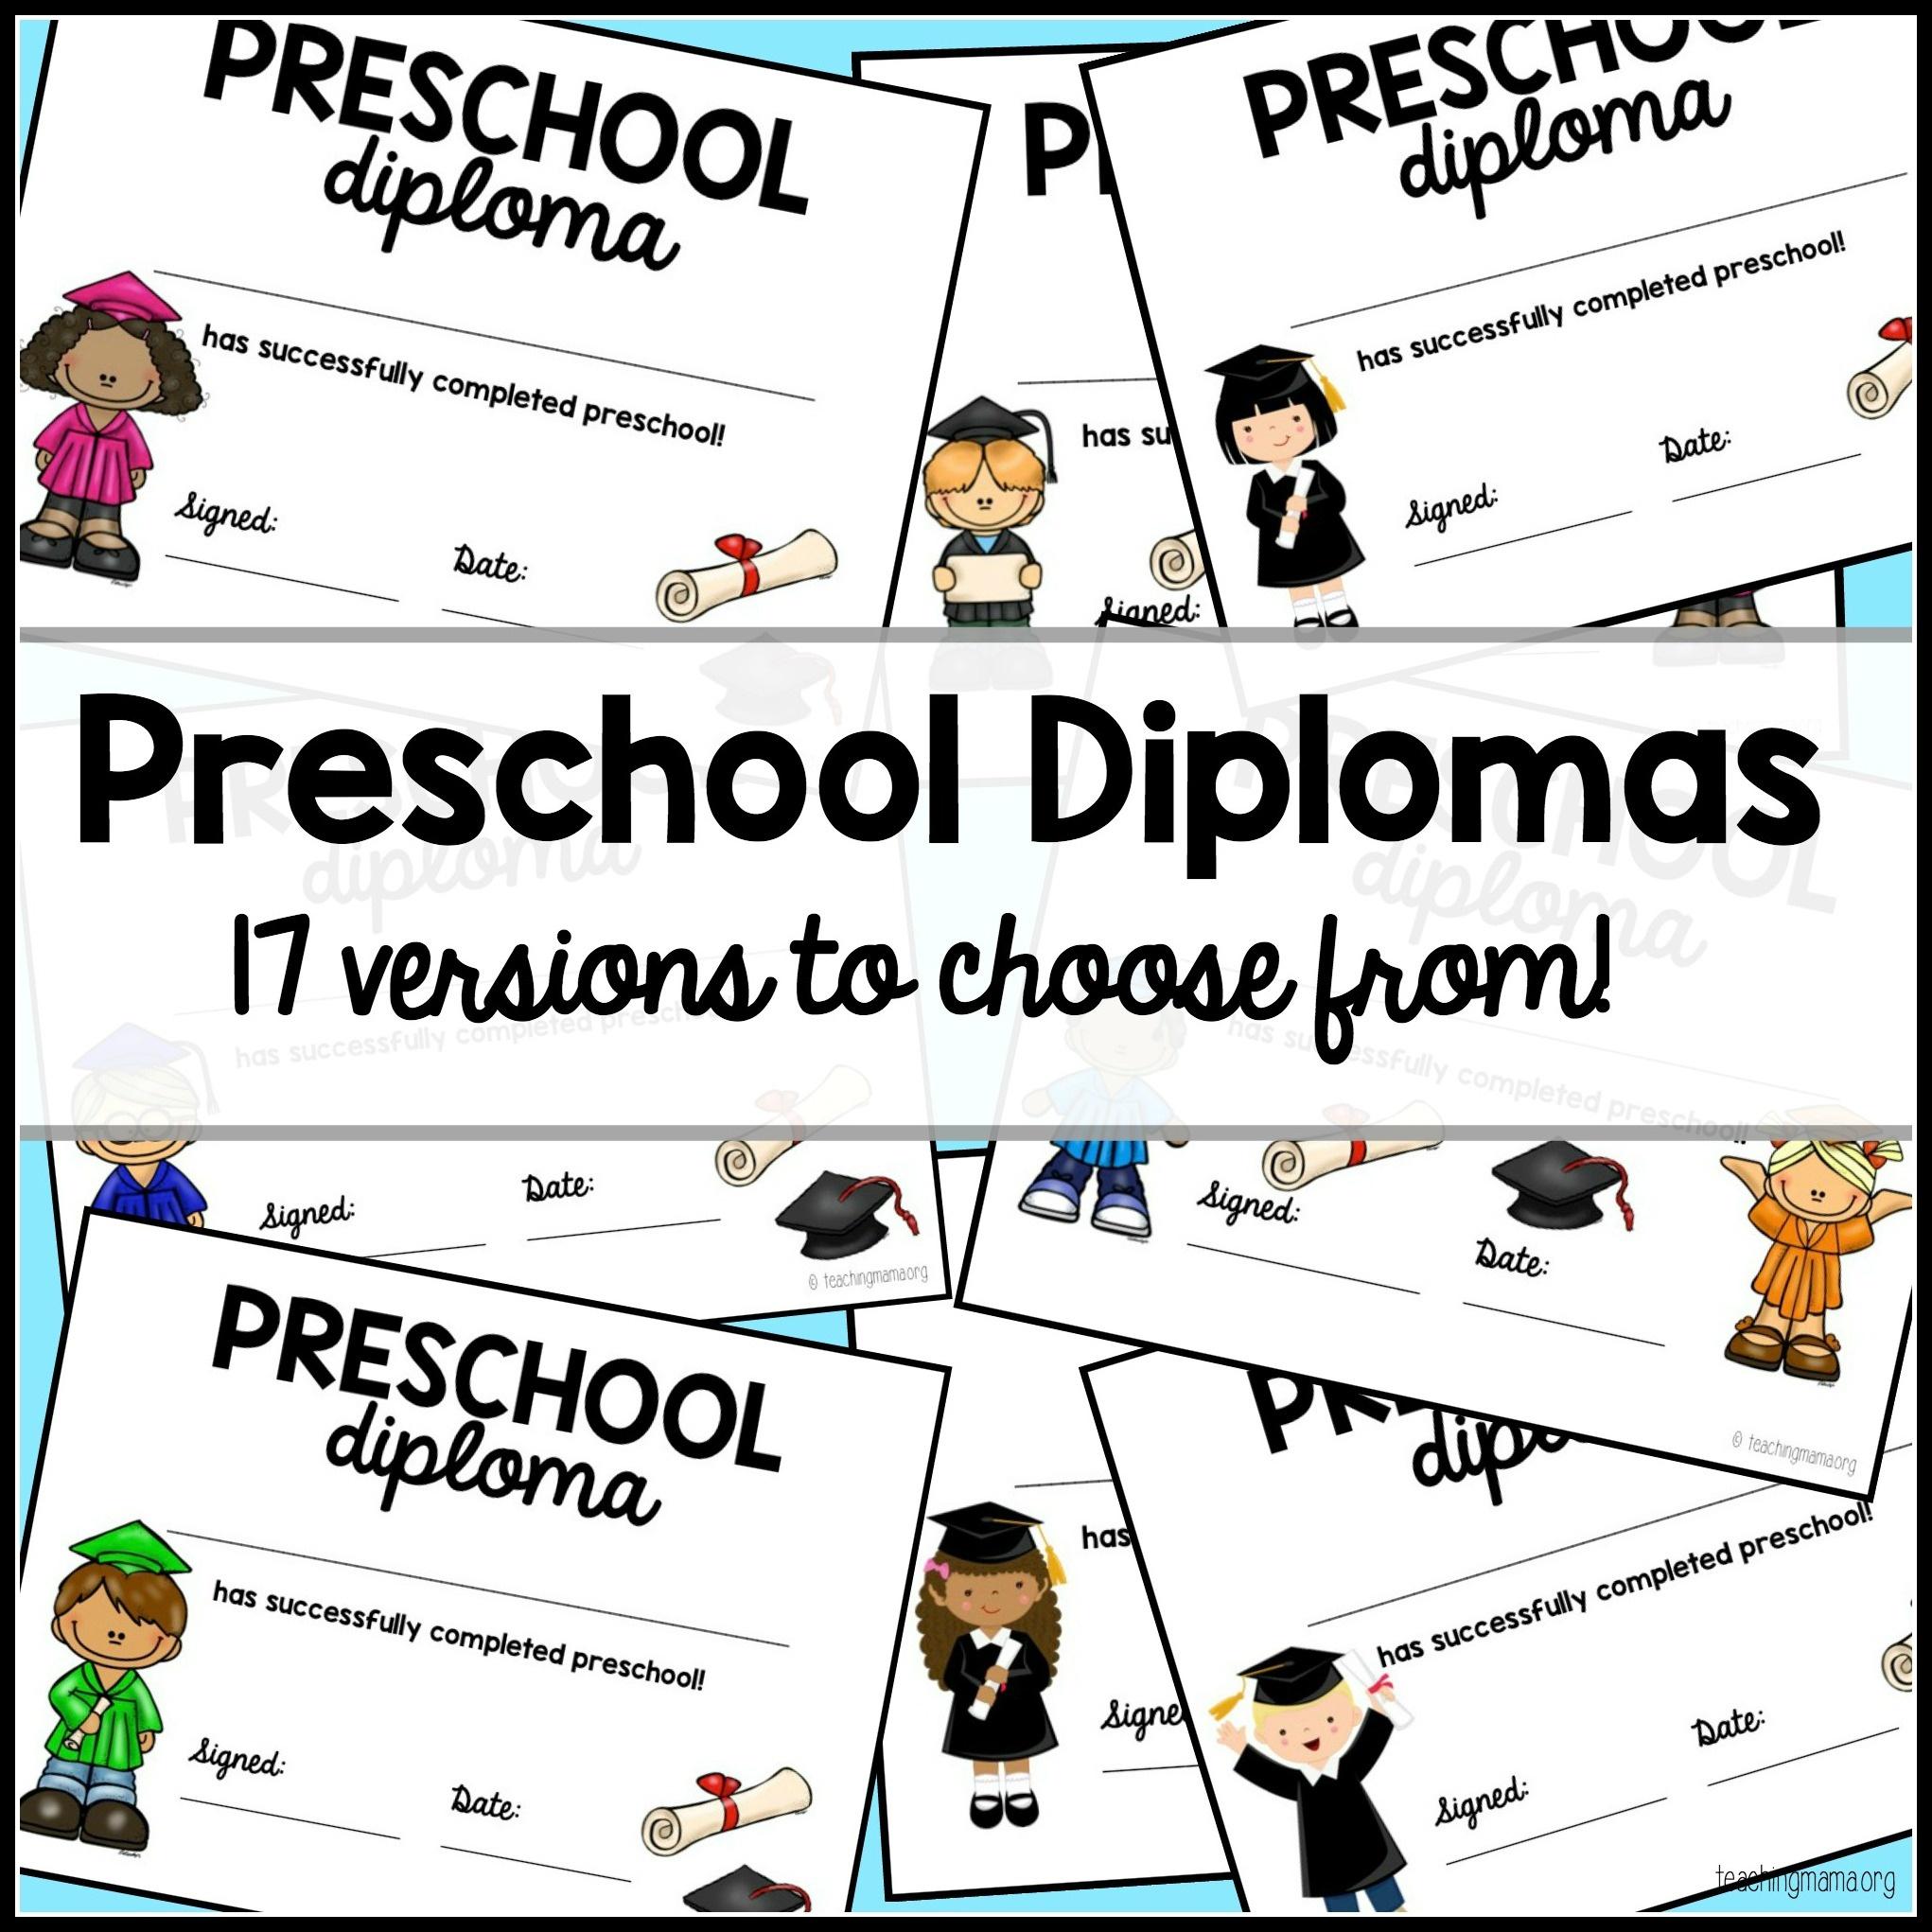 Preschool Graduation Diploma - Free Printable Preschool Diplomas